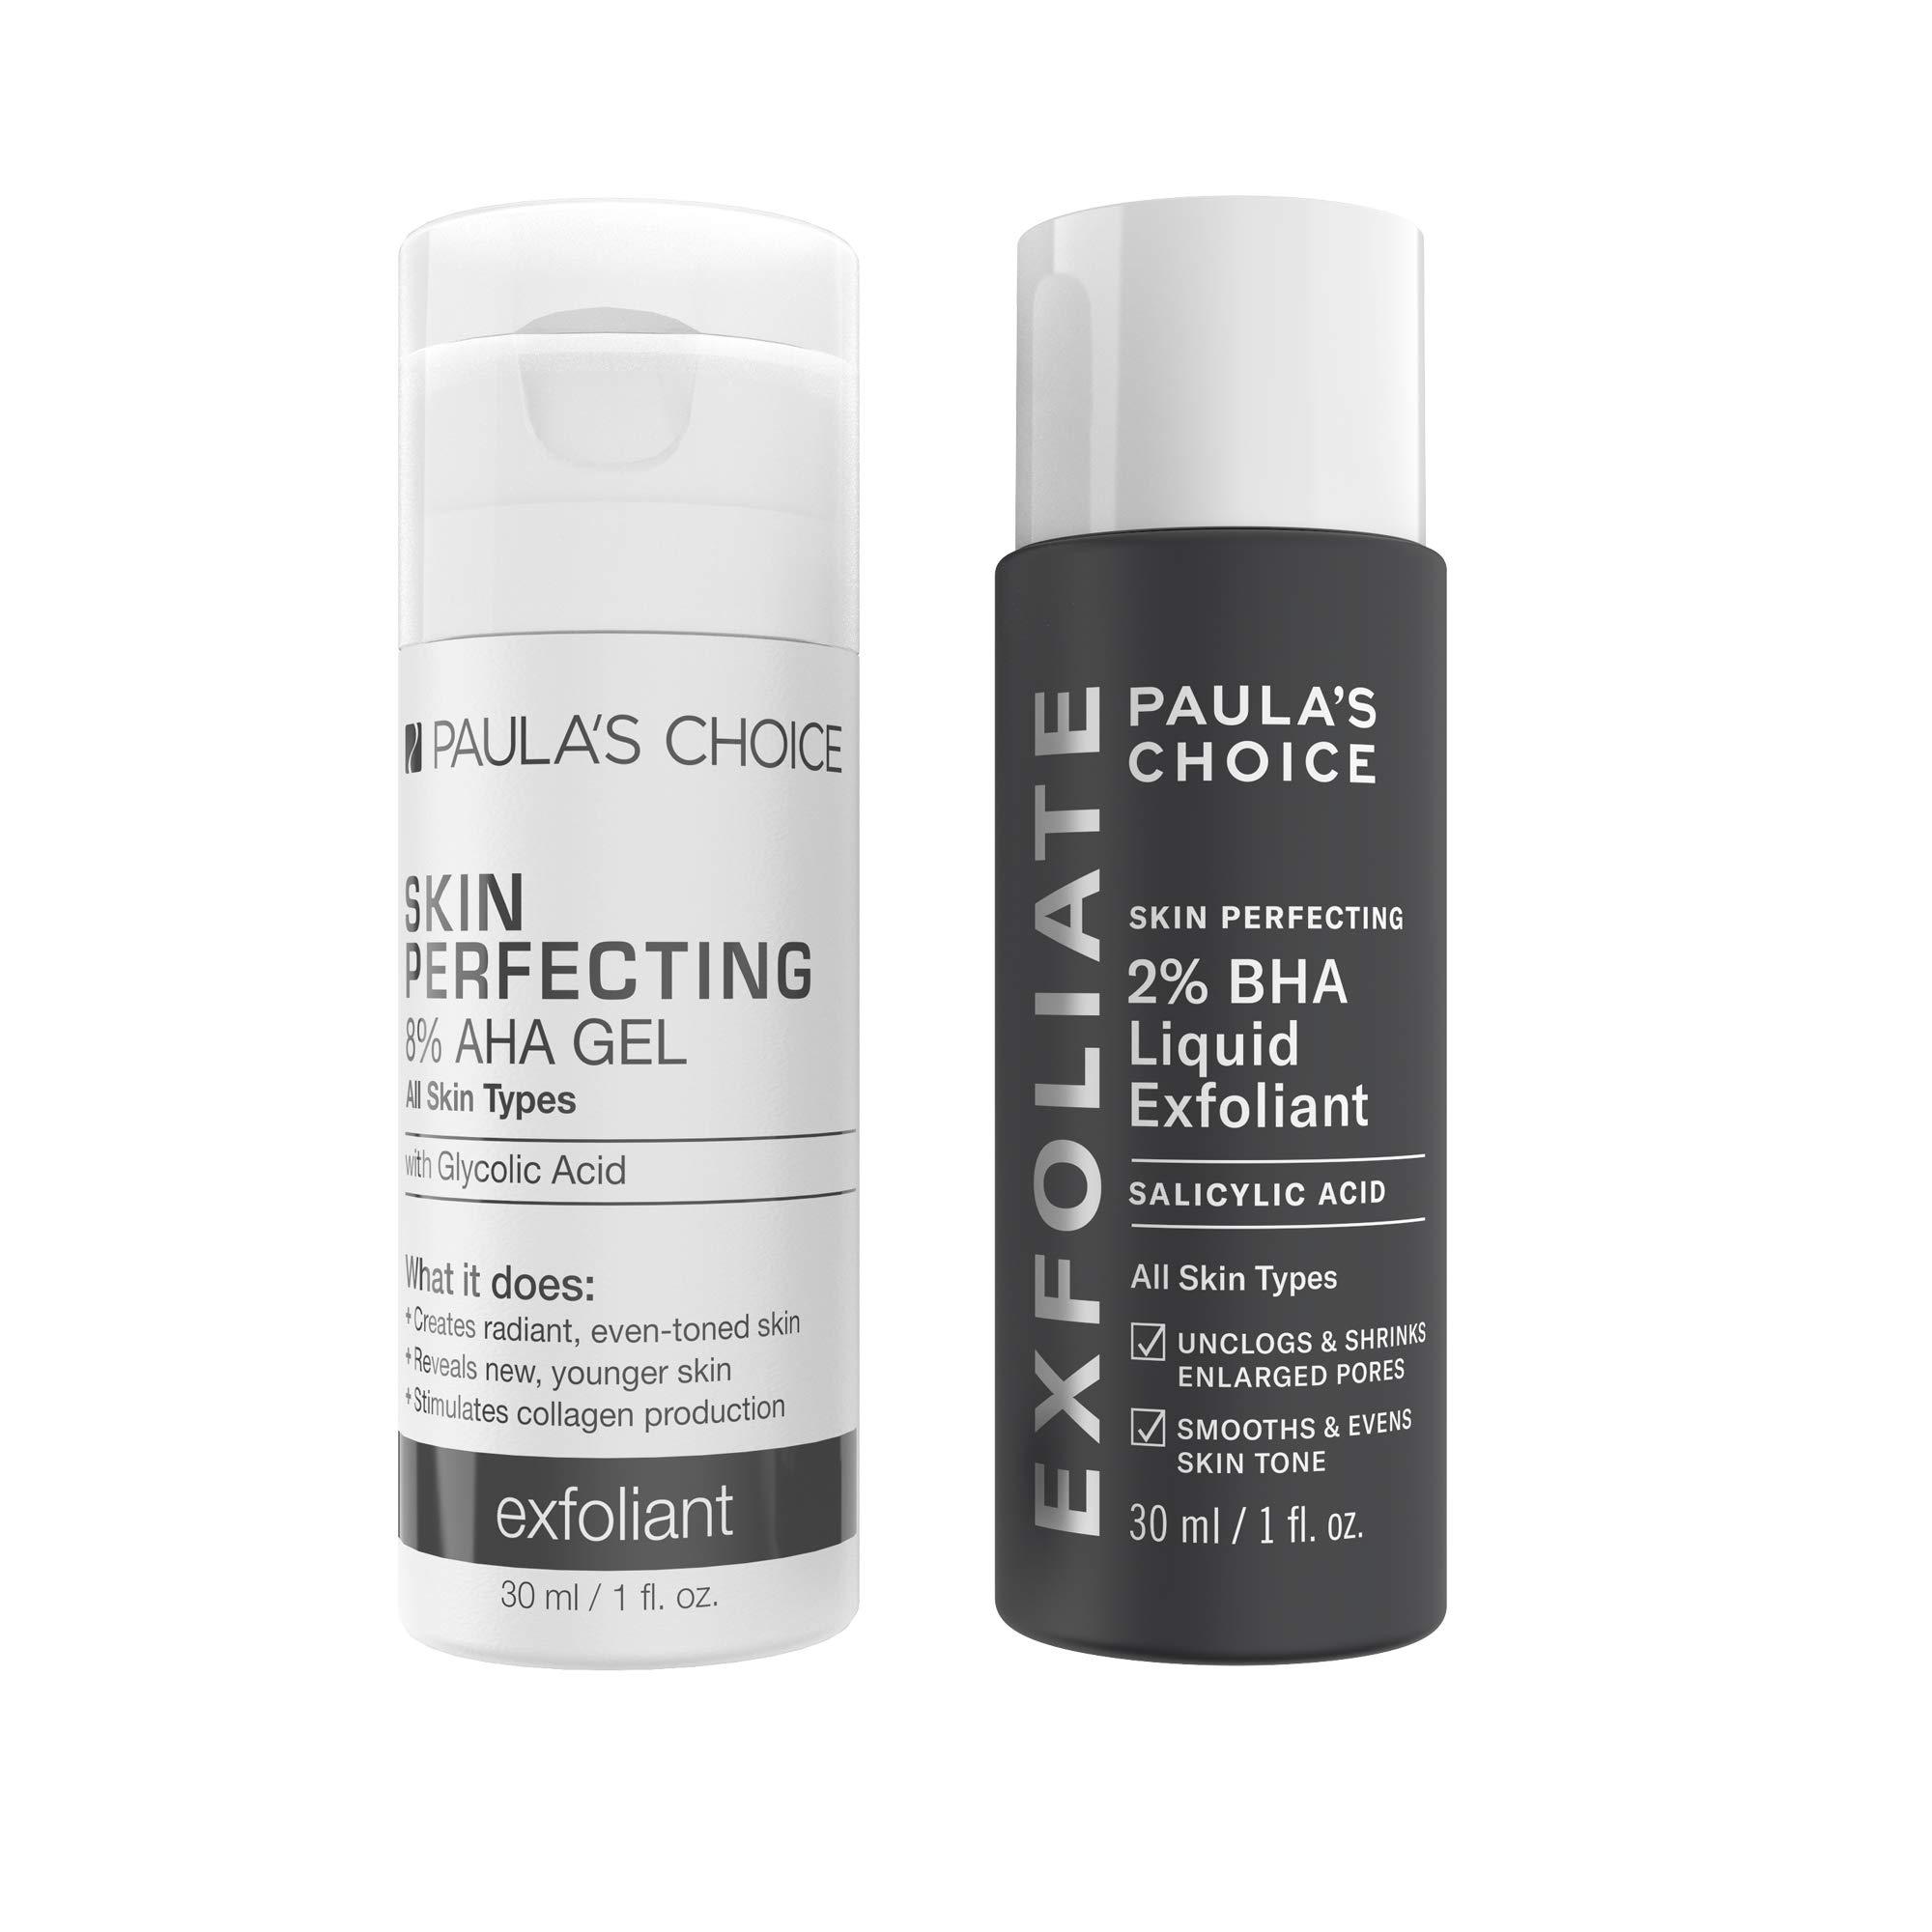 Paula's Choice-SKIN PERFECTING 8% AHA Gel Exfoliant & 2% BHA Liquid Travel Duo-Facial Exfoliants for Blackheads Enlarged Pores Wrinkles and Fine Lines Face Exfoliators w/Glycolic Acid Salicylic Acid